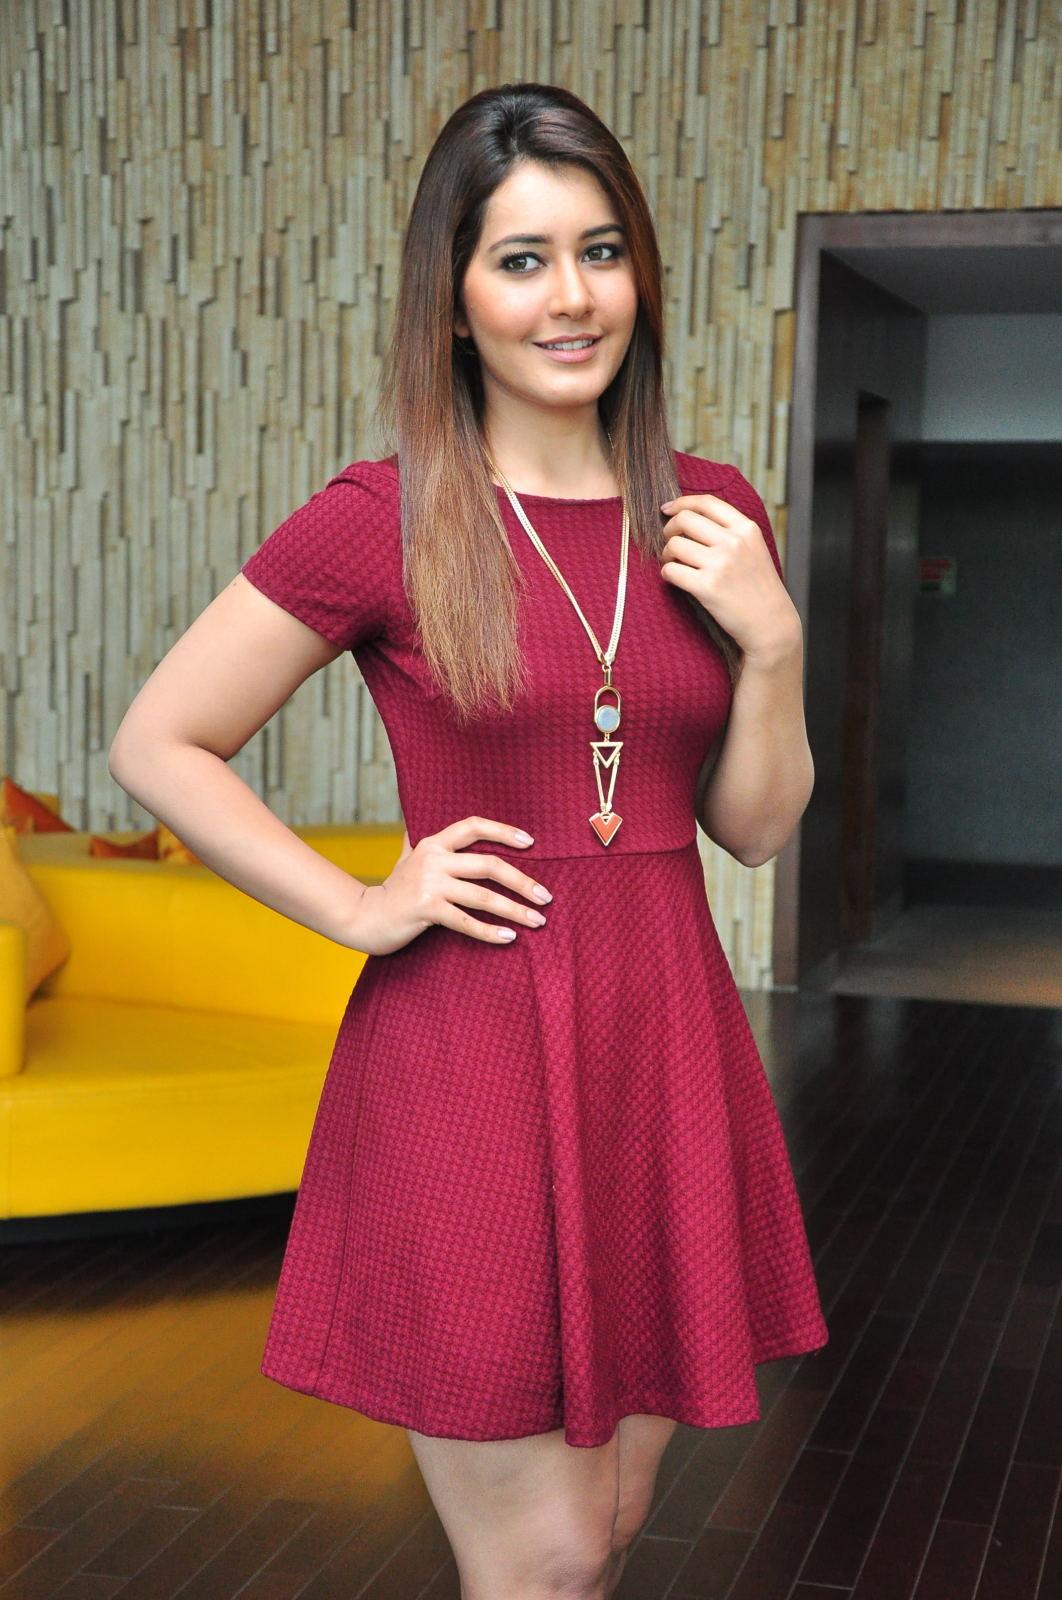 Rashi Khanna Legs Photos Outdoor Images Hd - Bolly Actress -5010